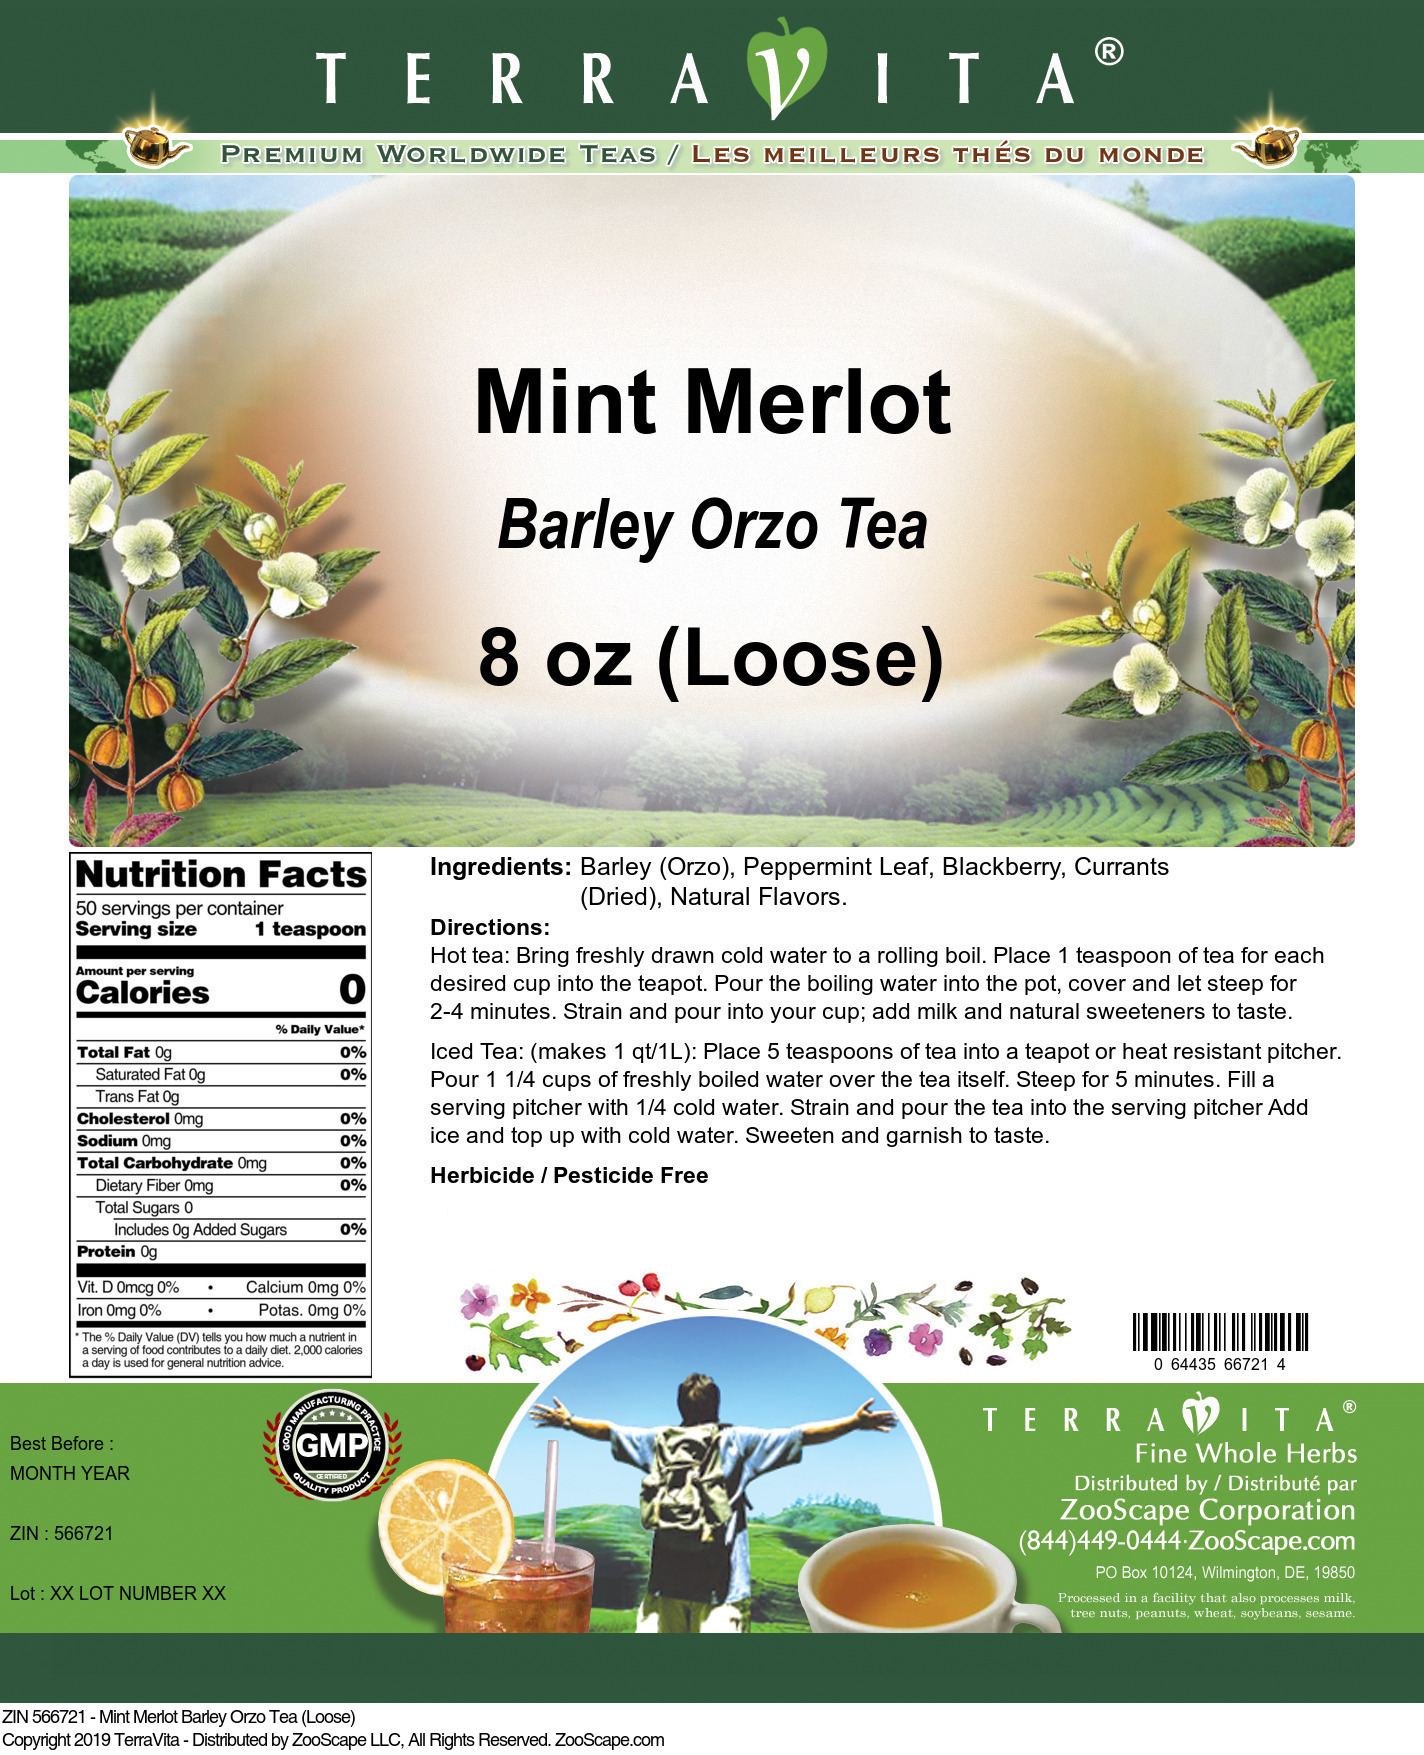 Mint Merlot Barley Orzo